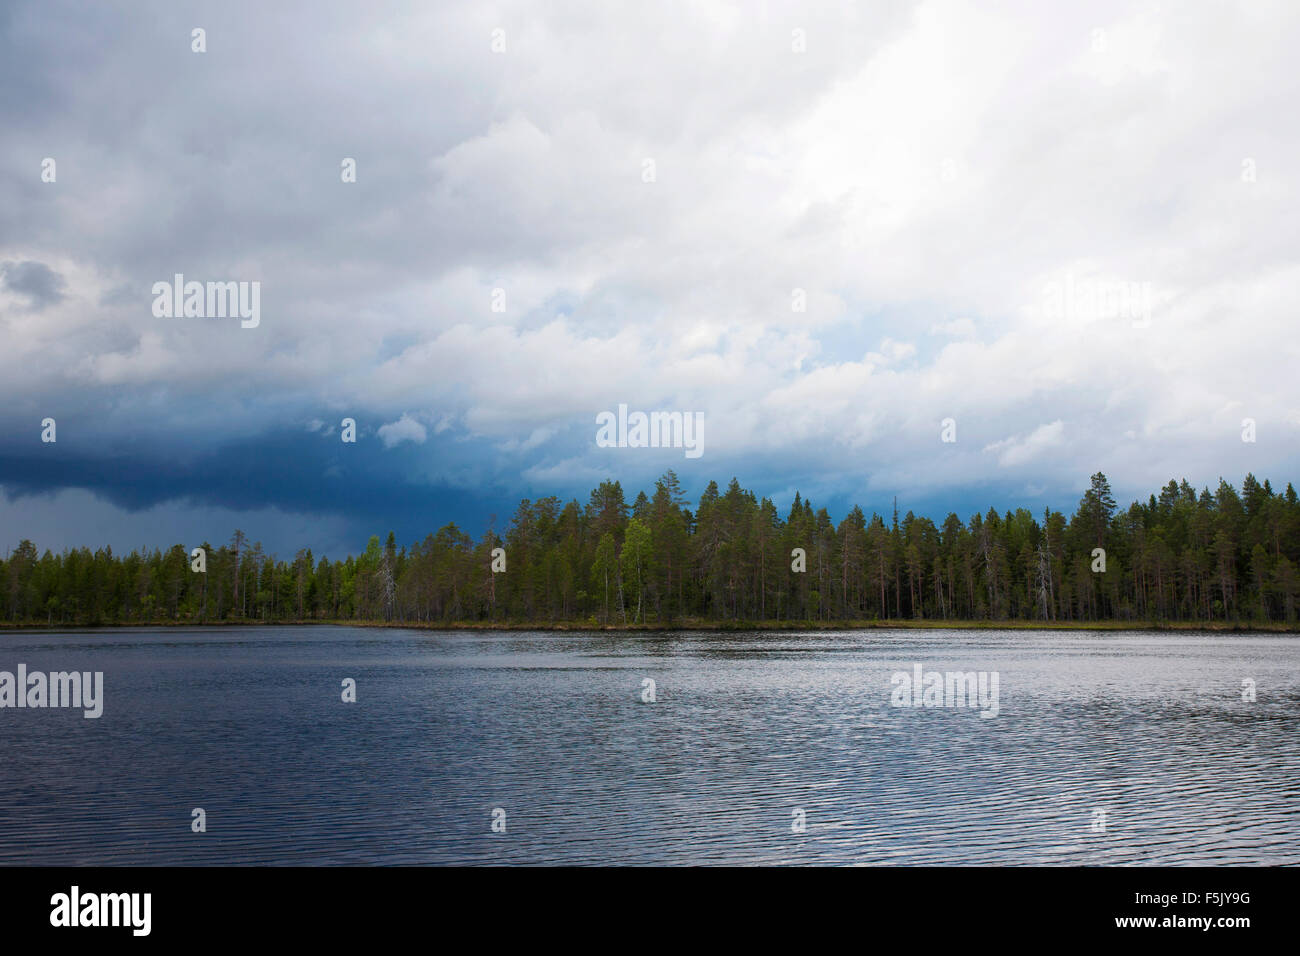 Rainy atmosphere at lake in Finnish Taiga, Kainuu, North Karelia, Finland - Stock Image